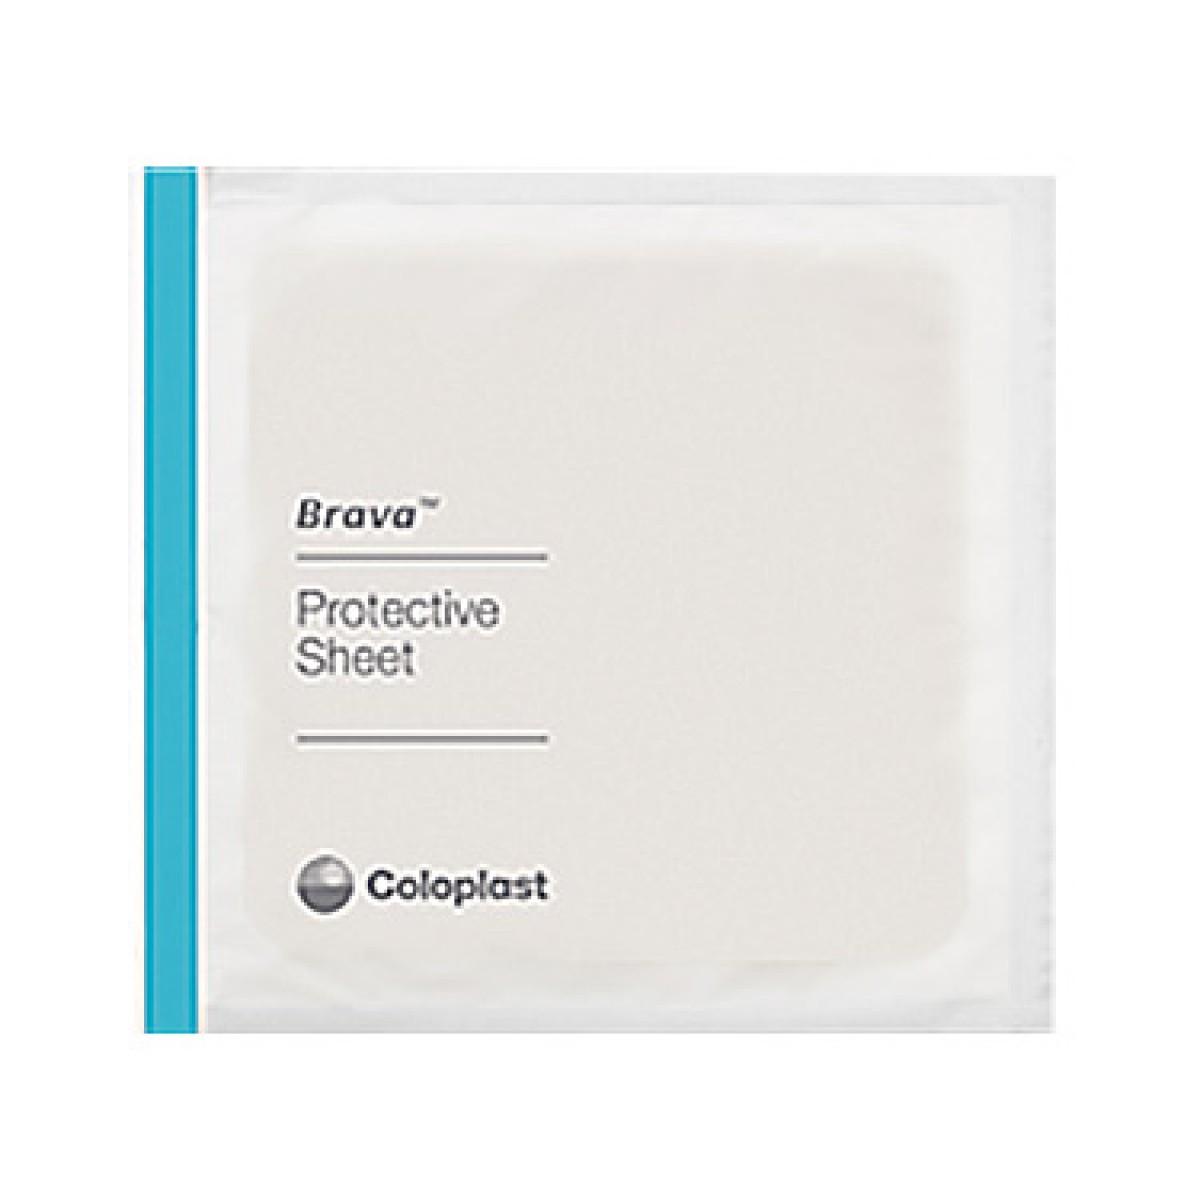 Brava Placa Protetora 15 X 15 3215 - (Coloplast)